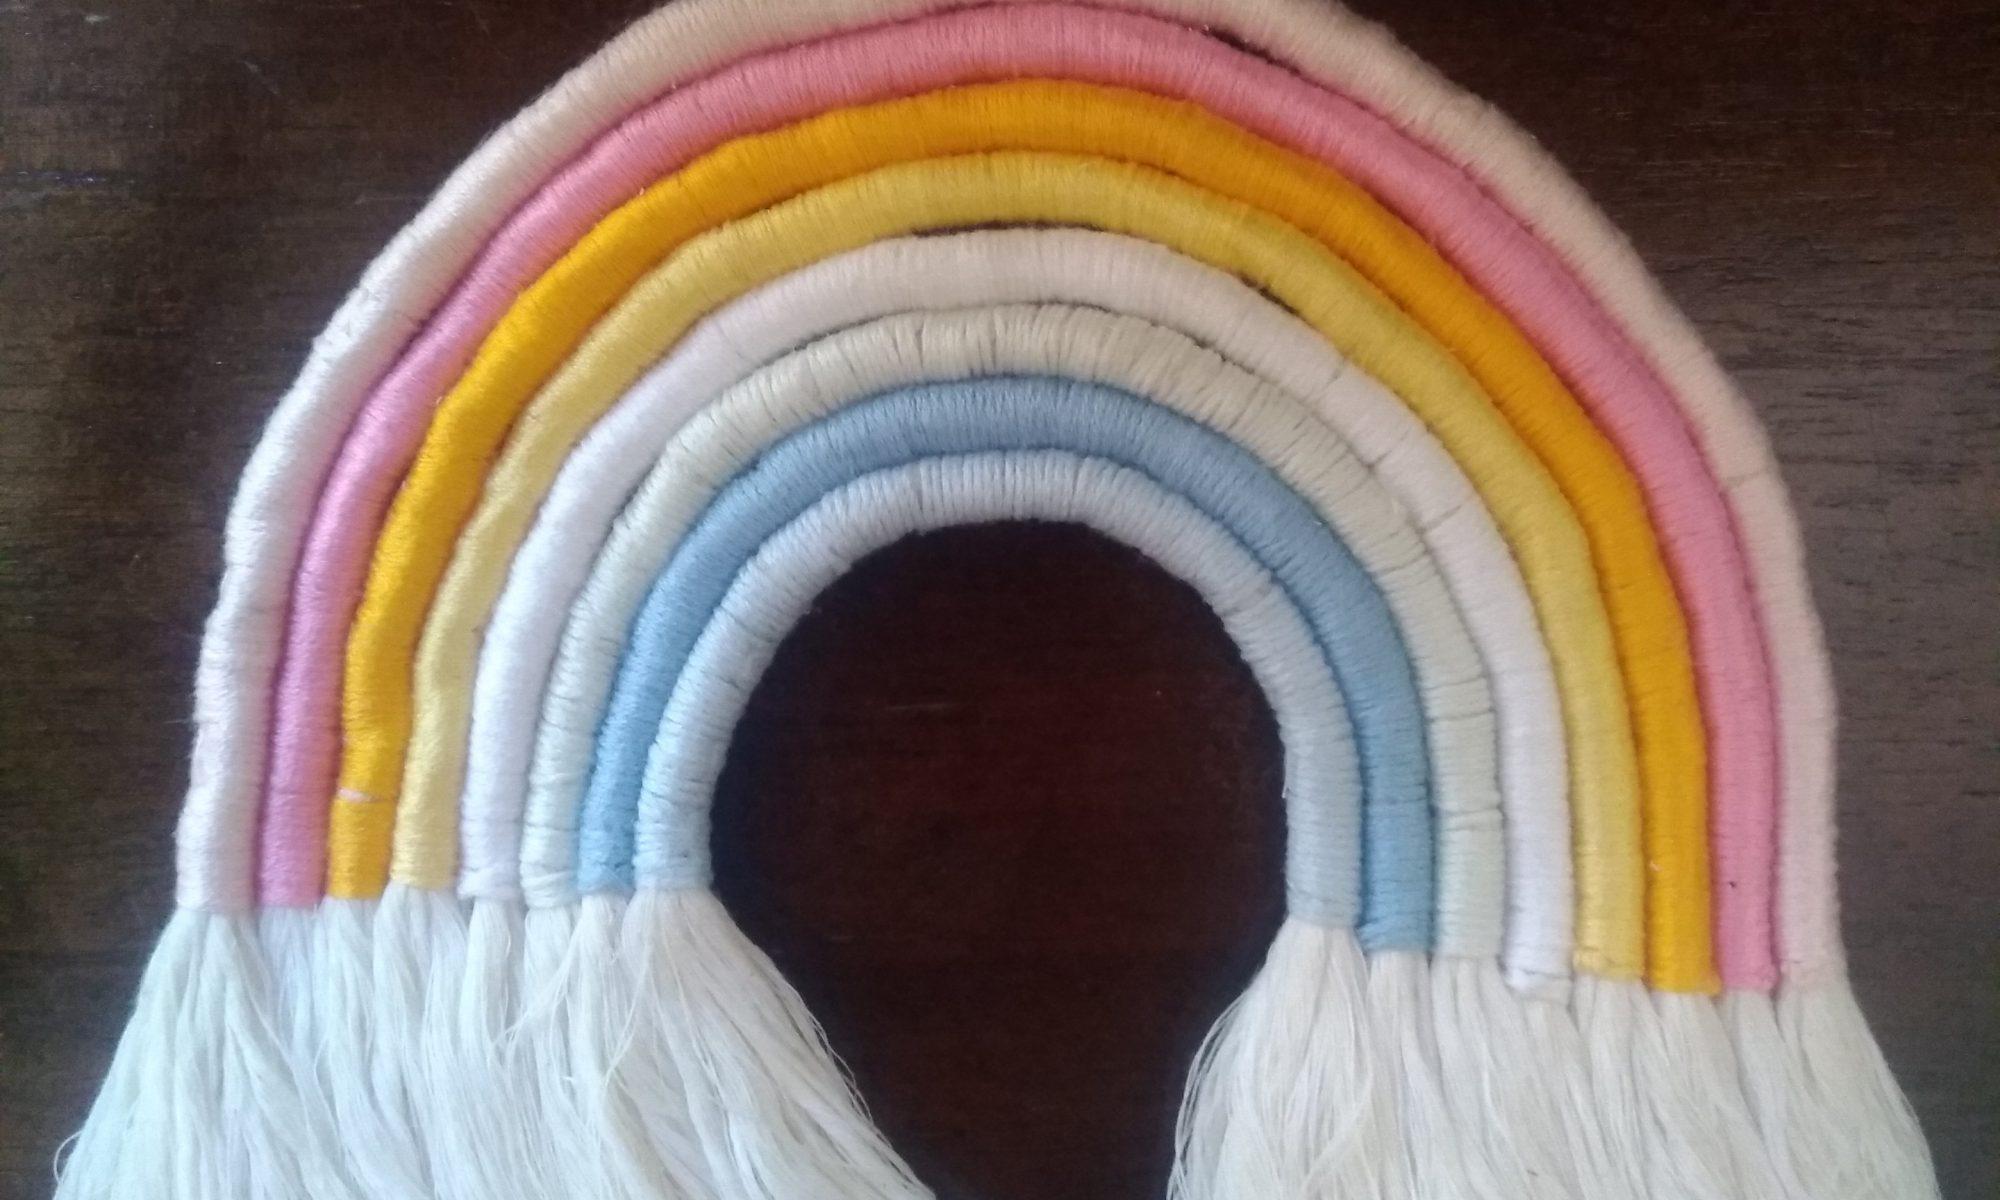 REgenbogen aus farbigen Schüren